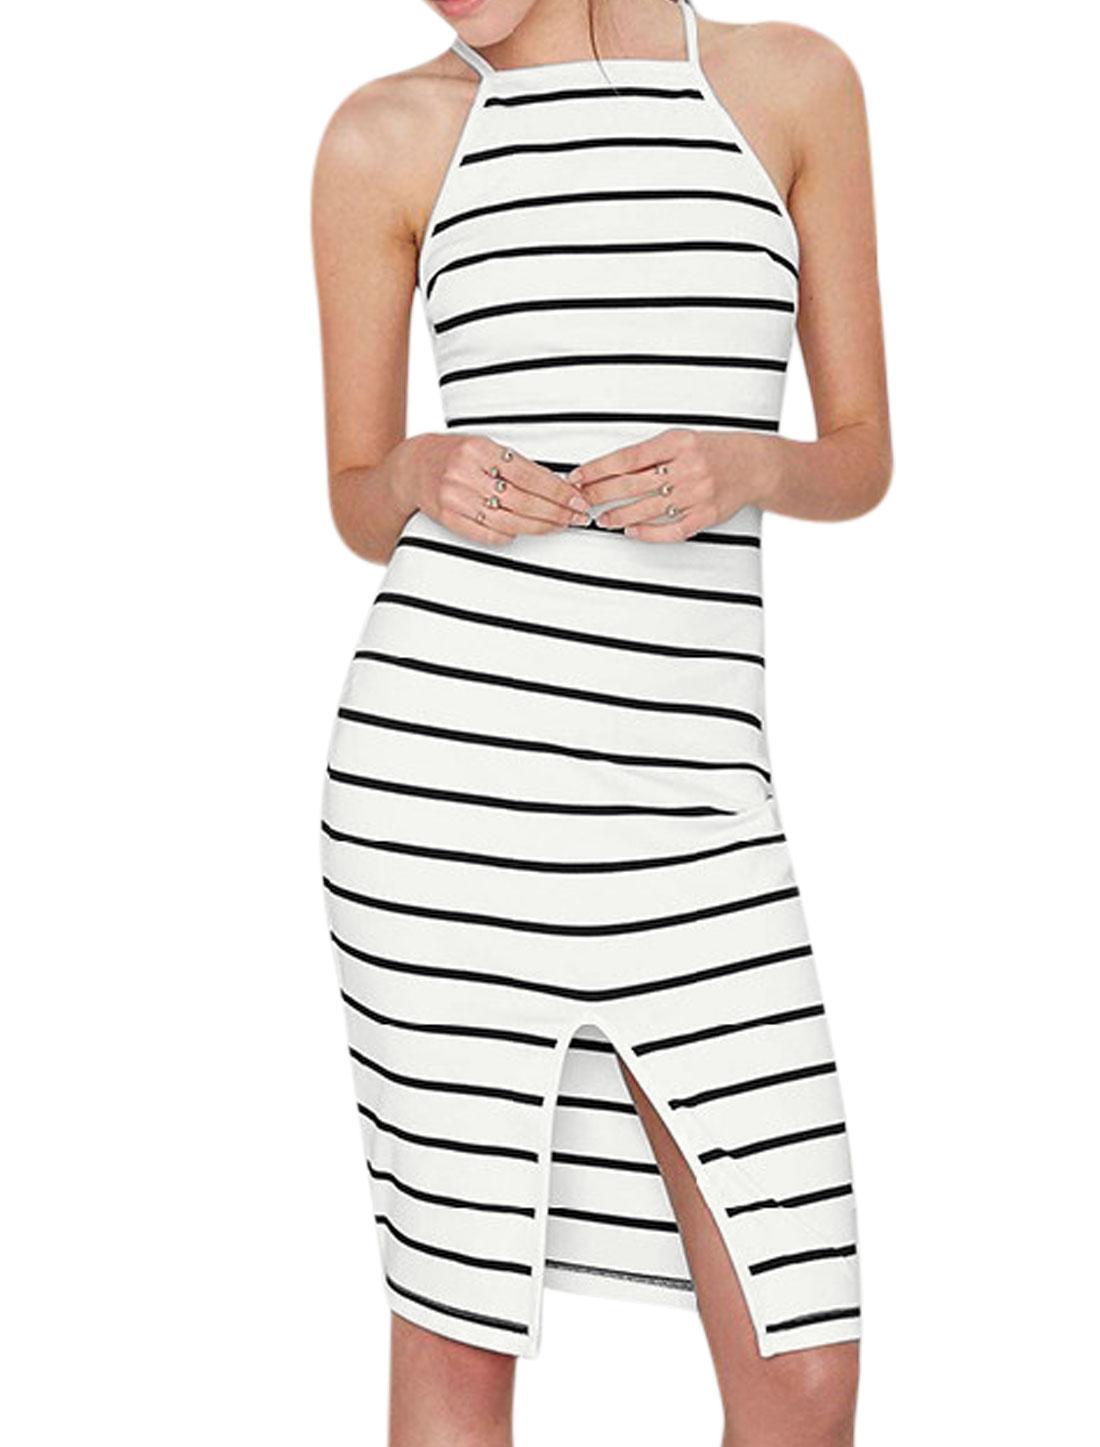 Woman Stripes Halter Neck Split Front Unlined Sheath Dress Black White L